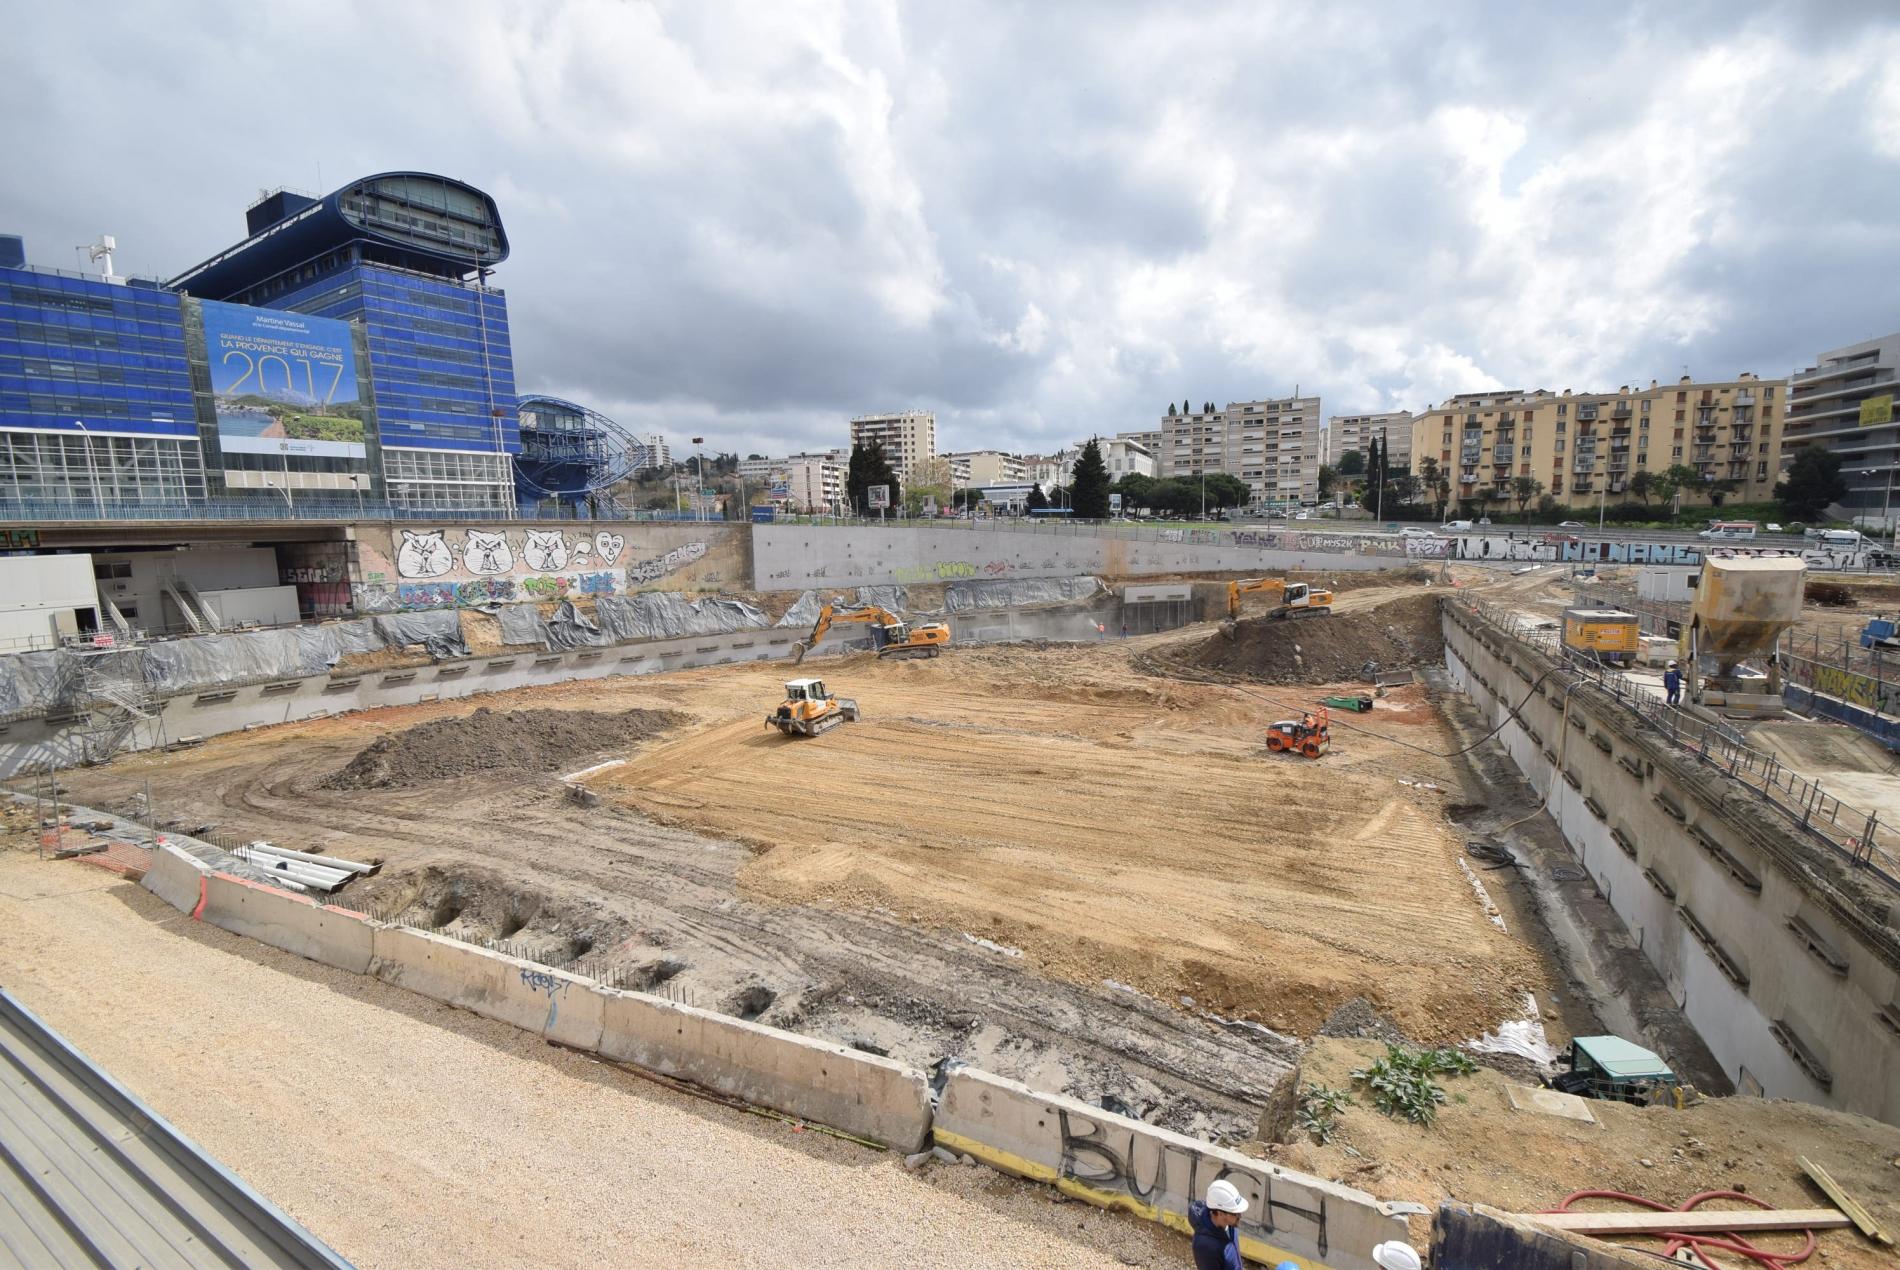 La Calanque en chantier à Marseille !